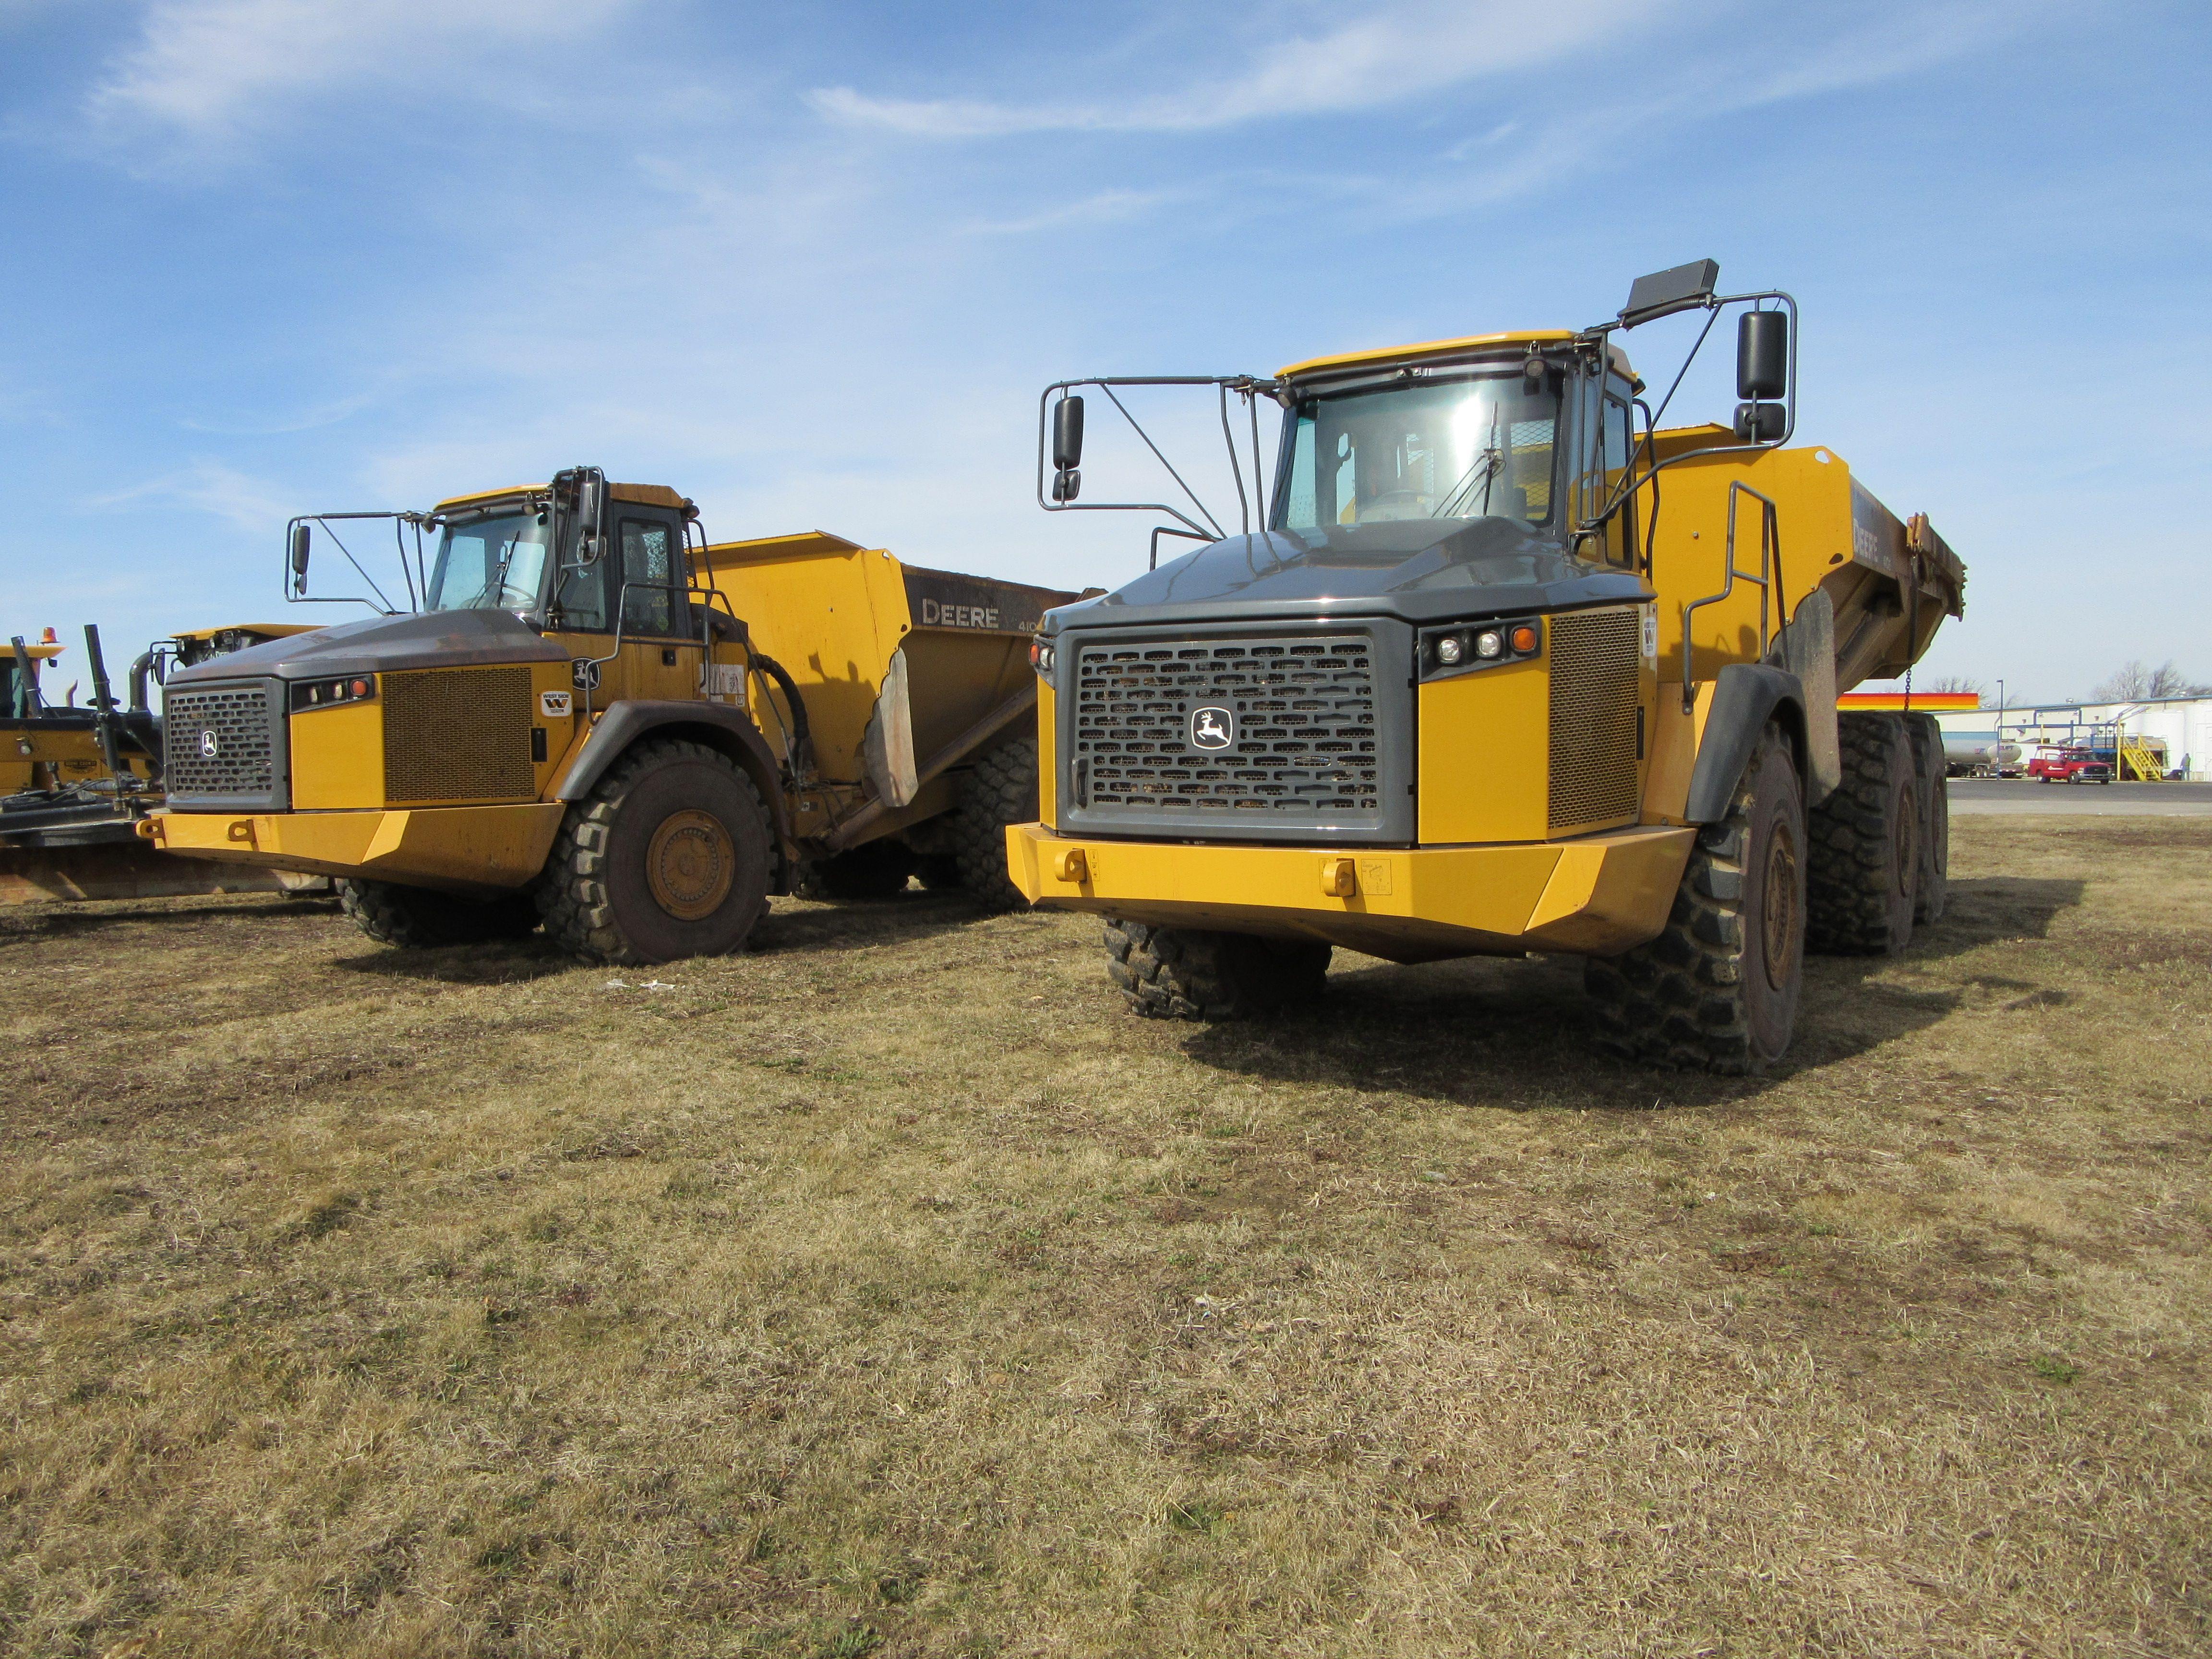 yellow john deere 310sk backhoe & blue tri axle mack model rb dump